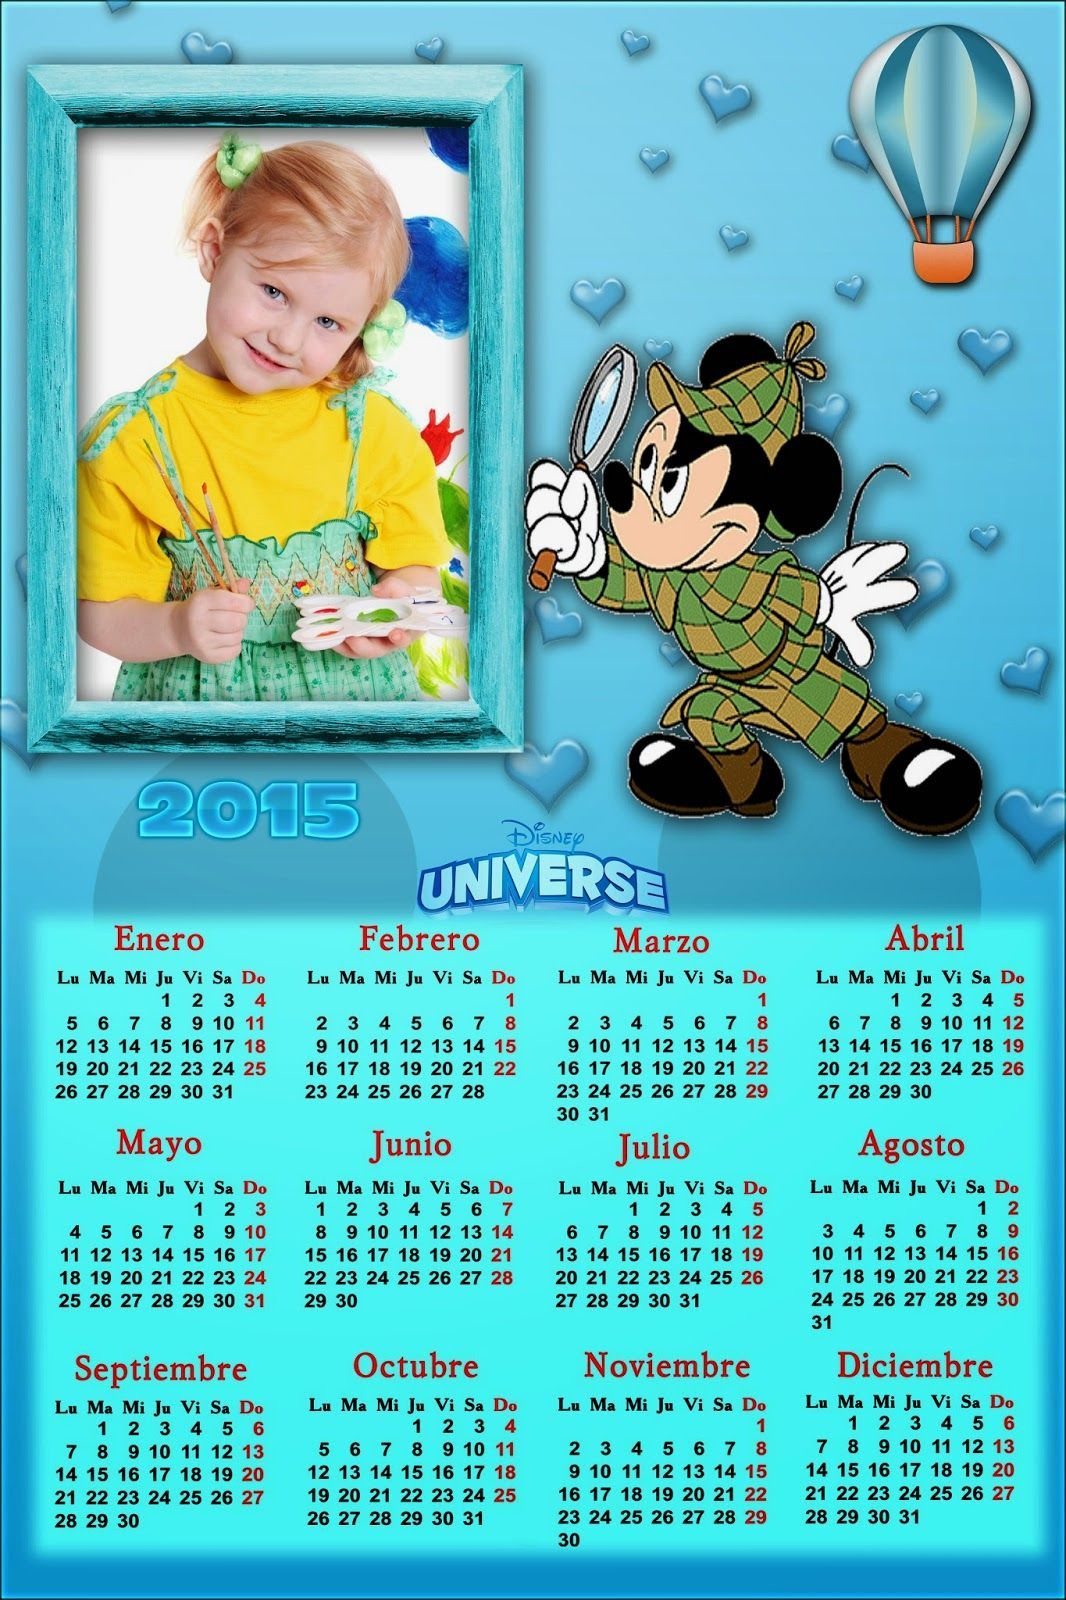 Recursos Photoshop Llanpac: Calendario del 2015 de Mickey Mouse para Photoshop...